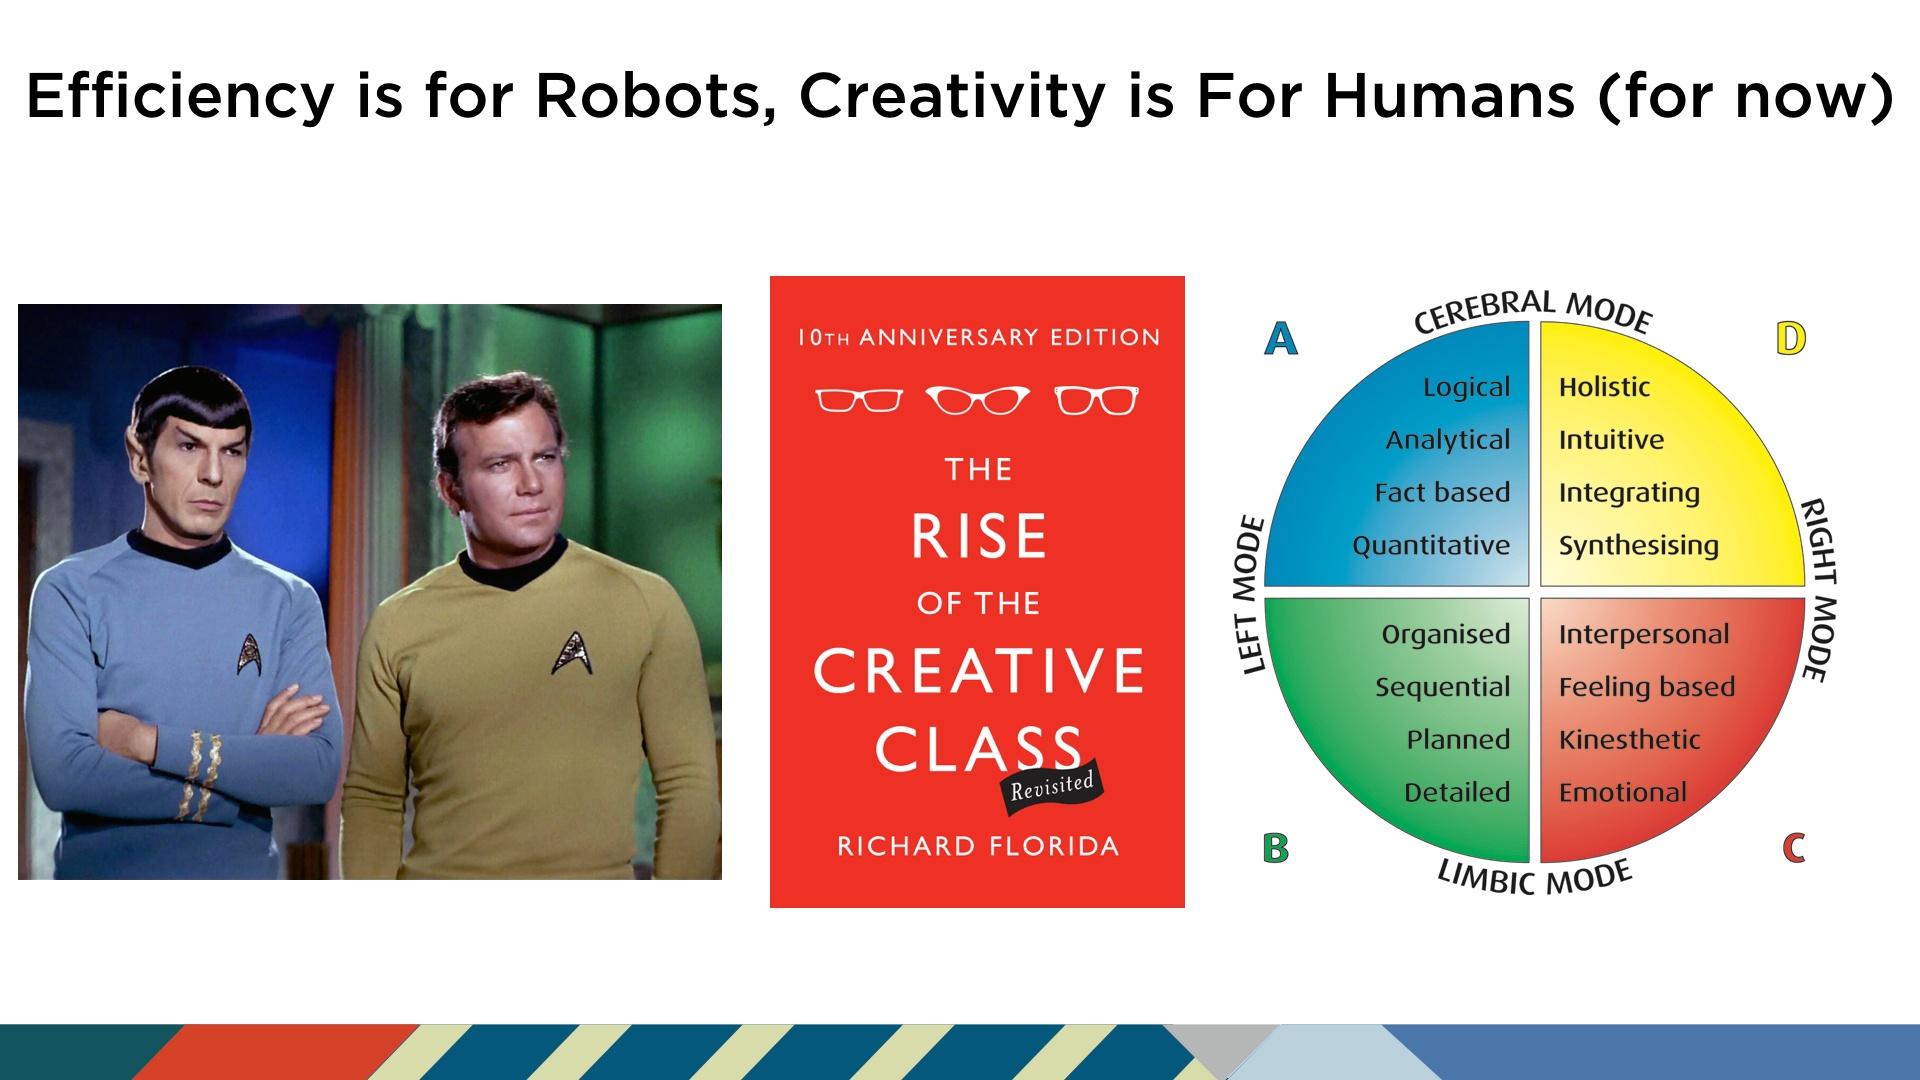 Spock and Kirk HBDI Futurist Anders Sorman-Nilsson